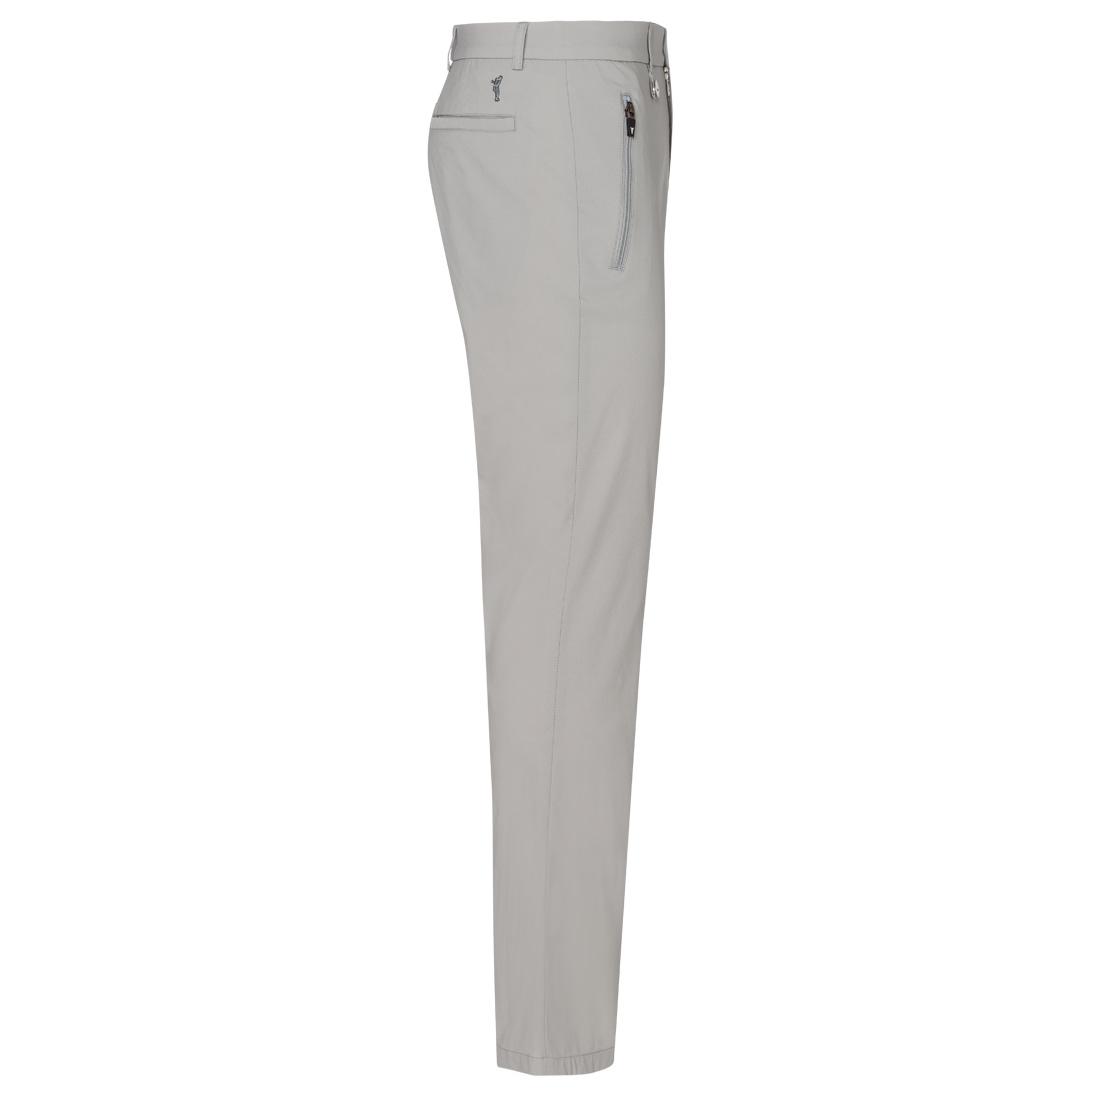 Zipped Pockets Techno Stretch Trouser